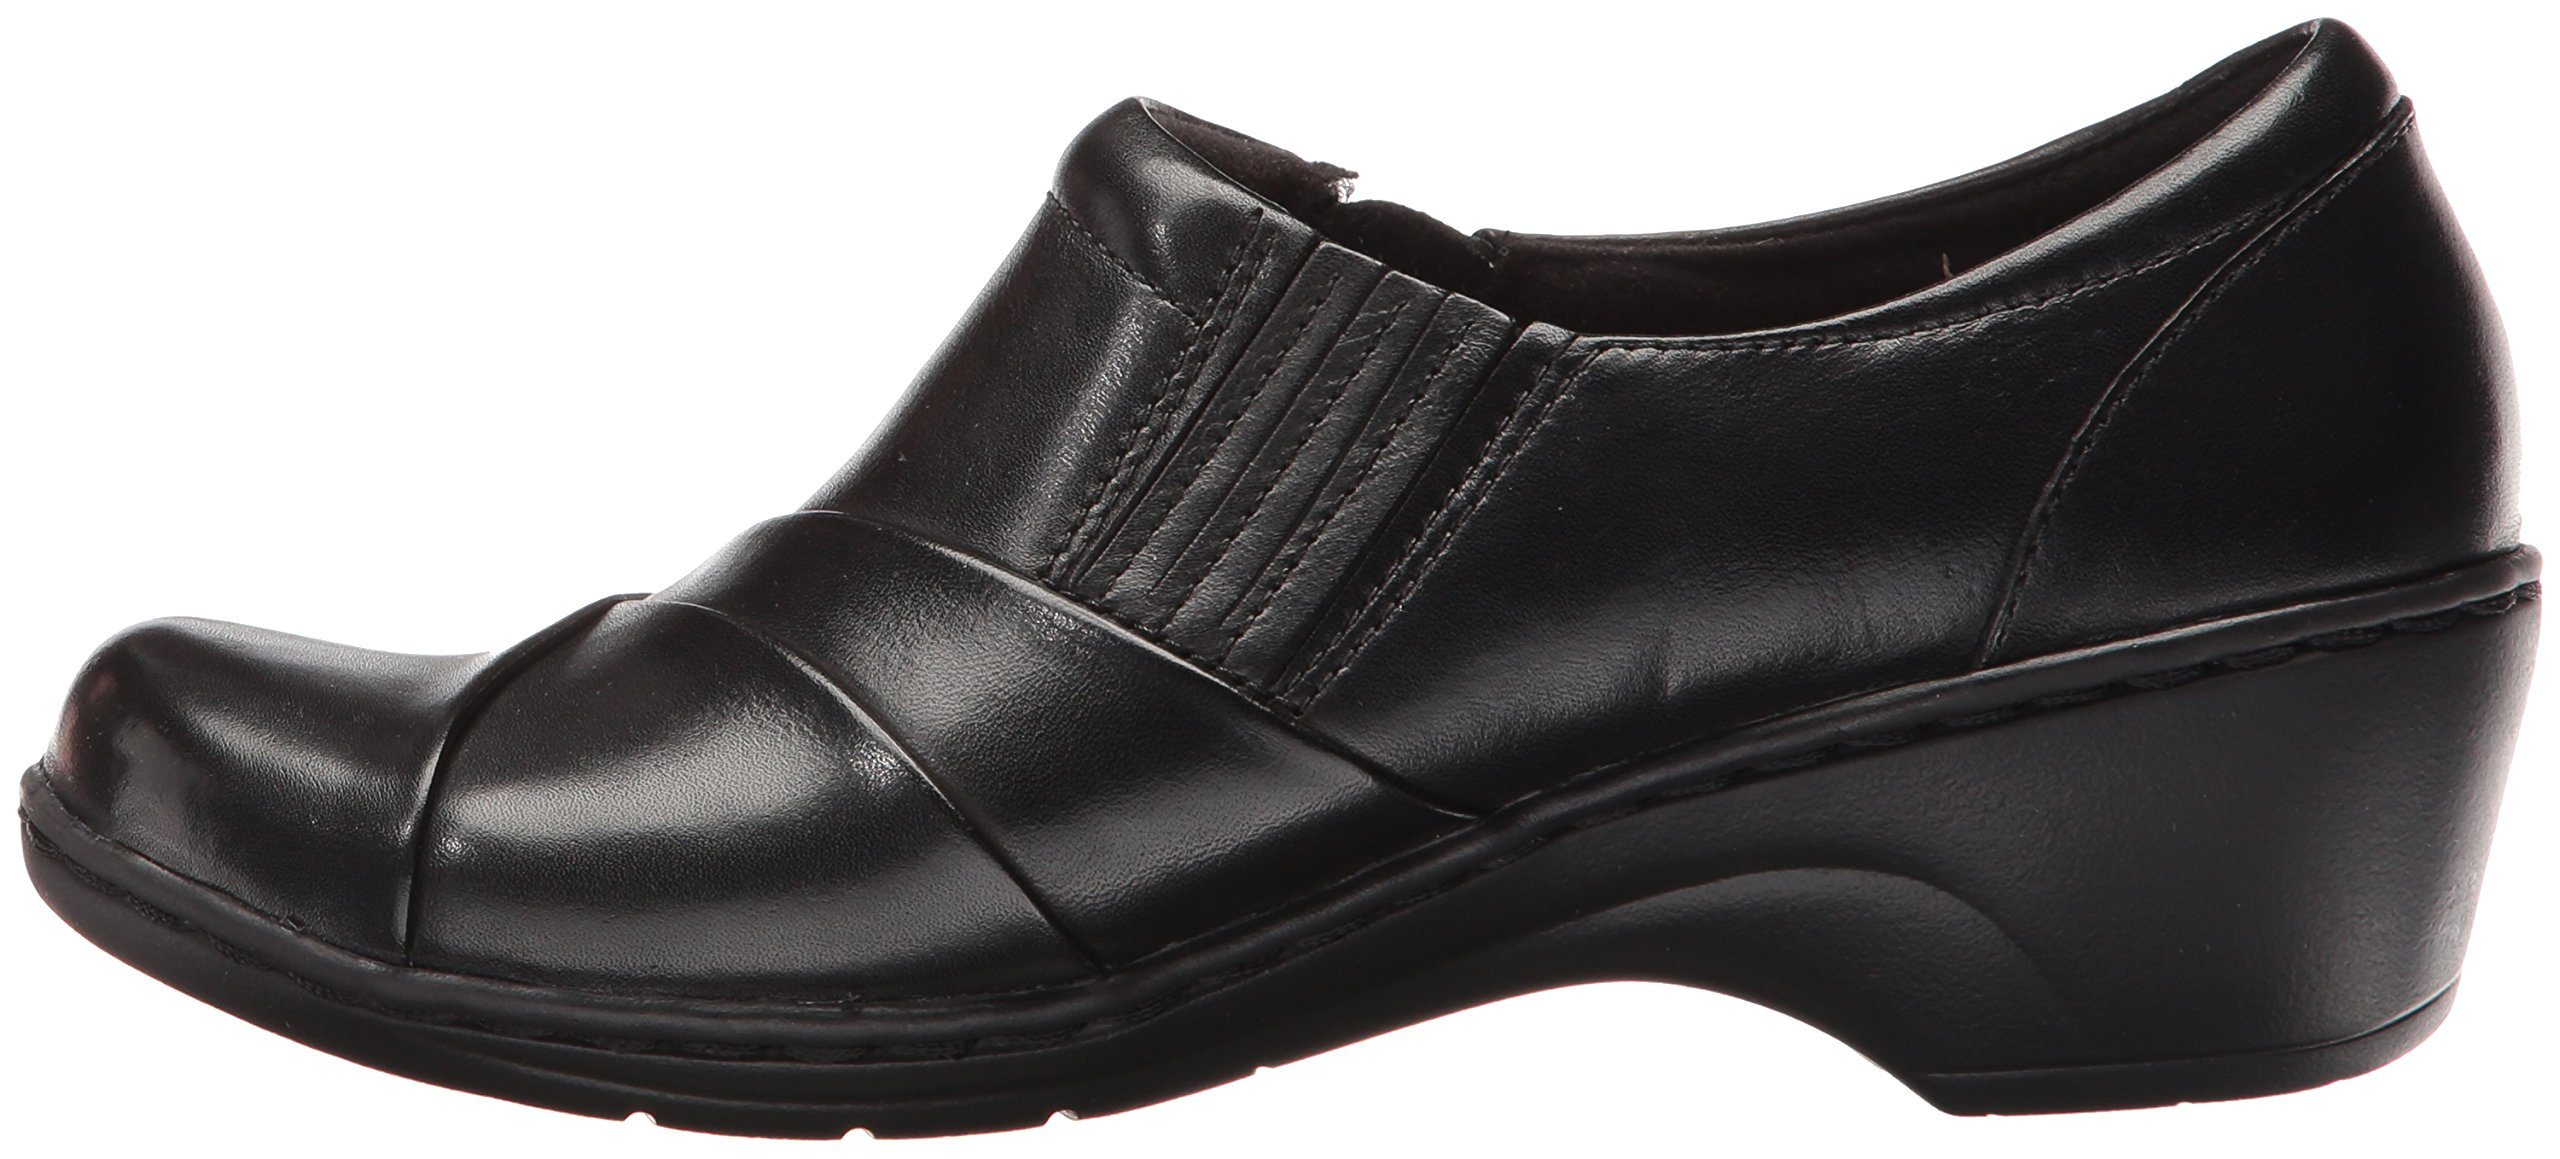 Clarks Women's Channing Essa Slip-On Loafer